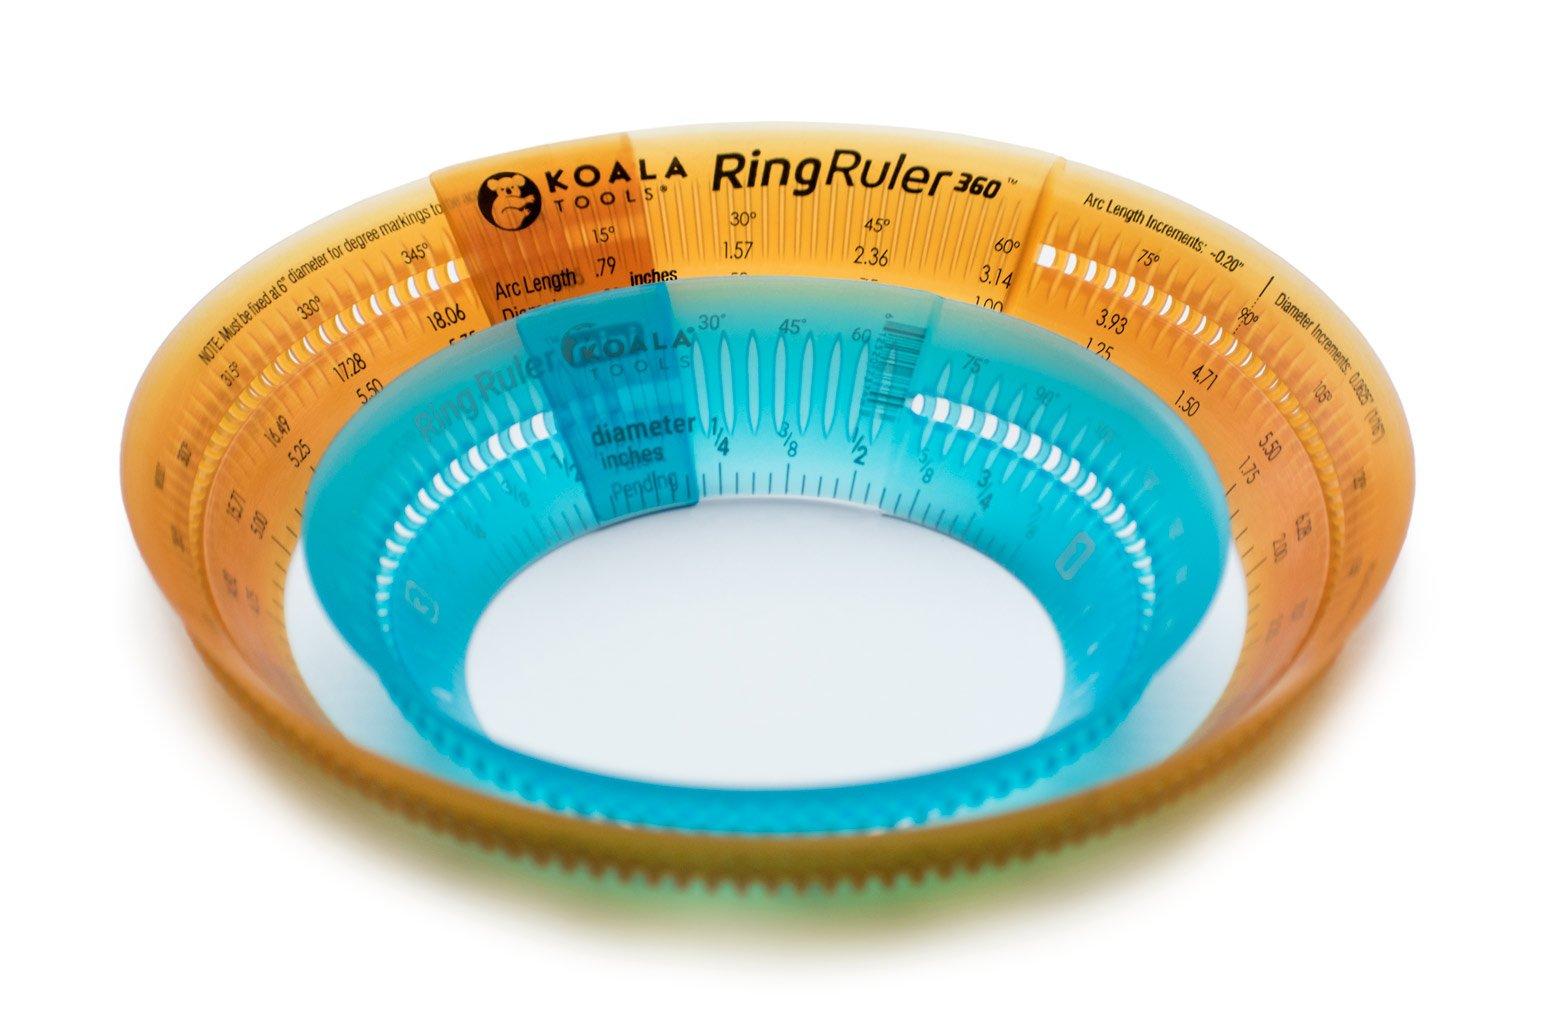 Koala Tools | Ring Ruler Combo Pack - Circle Stencil & Templates Tools | 1''- 3.5'' & 3'' - 6'' Adjustable Diameter - Geometric Tool for Drawing Circles